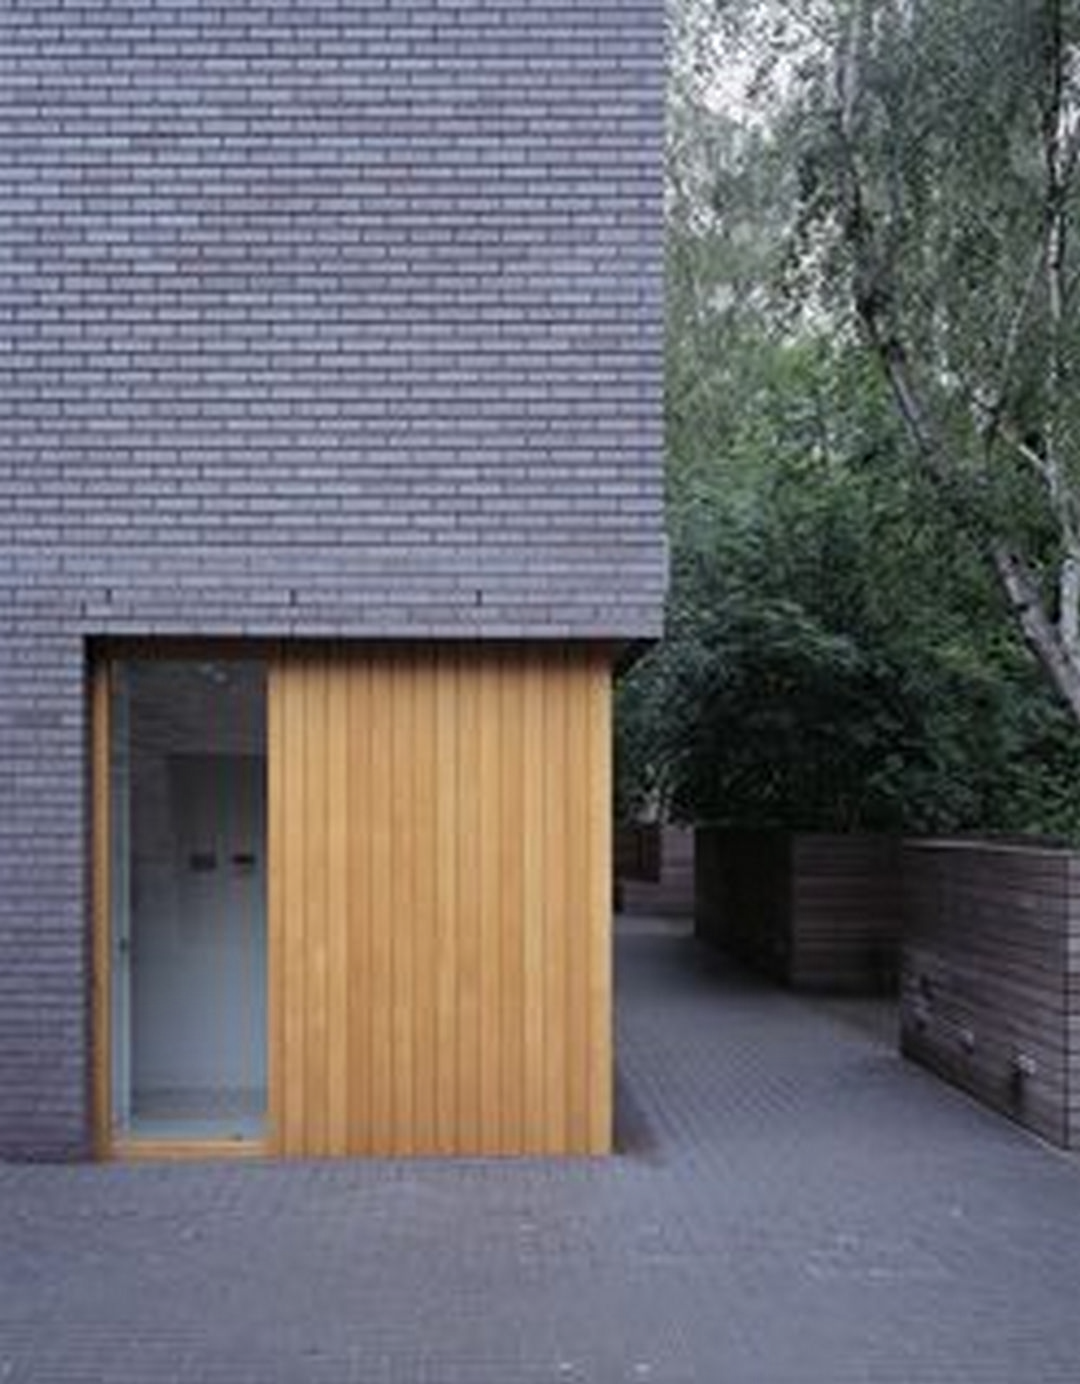 Stunning brick architecture inspirations 105 photos - Brick and wood house ...